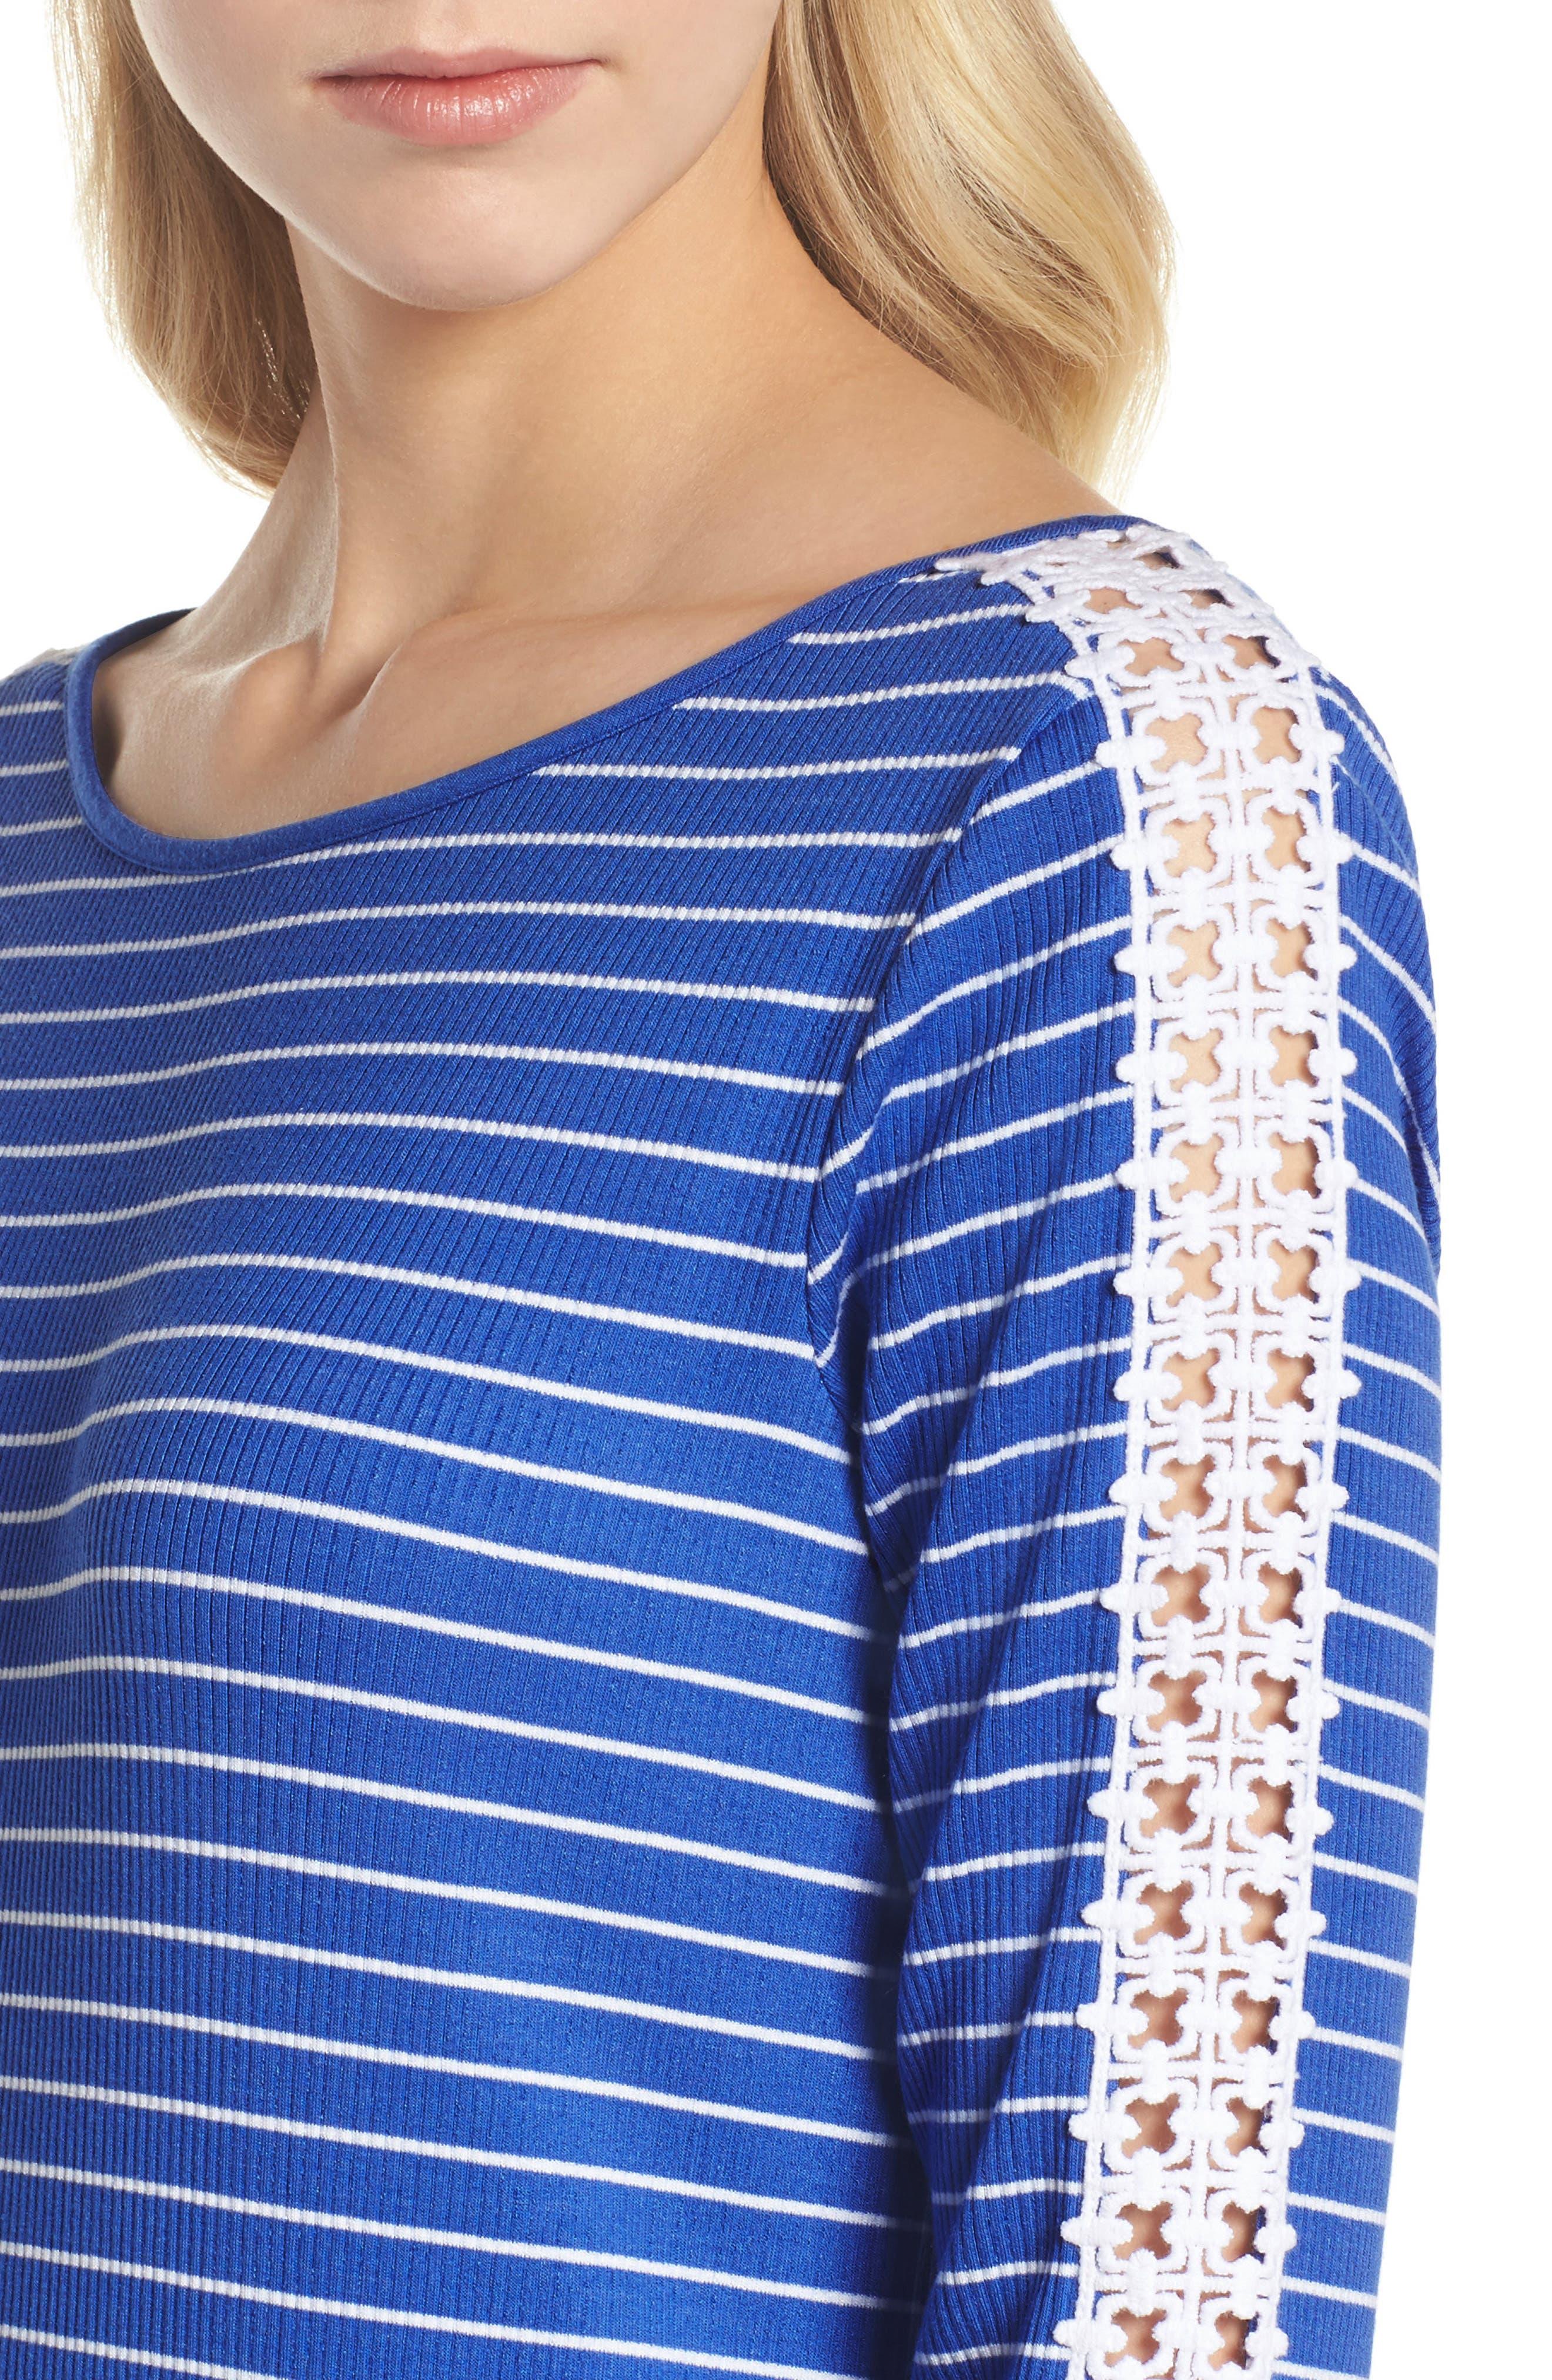 Marlowe Shift Dress,                             Alternate thumbnail 4, color,                             Beckon Blue Breeze Stripe